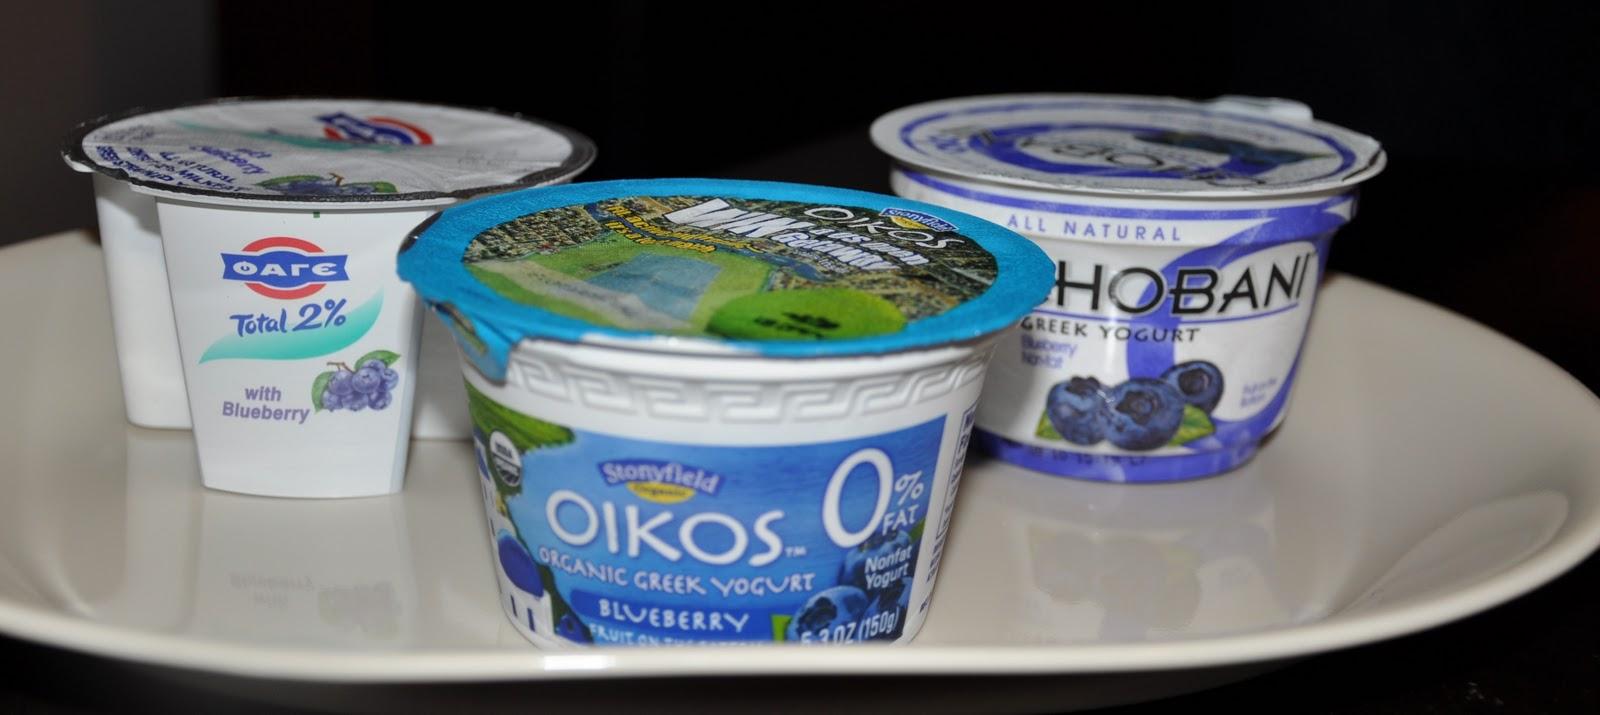 Taste Test: Best Greek Yogurt - Chobani vs  Fage vs  Oikos